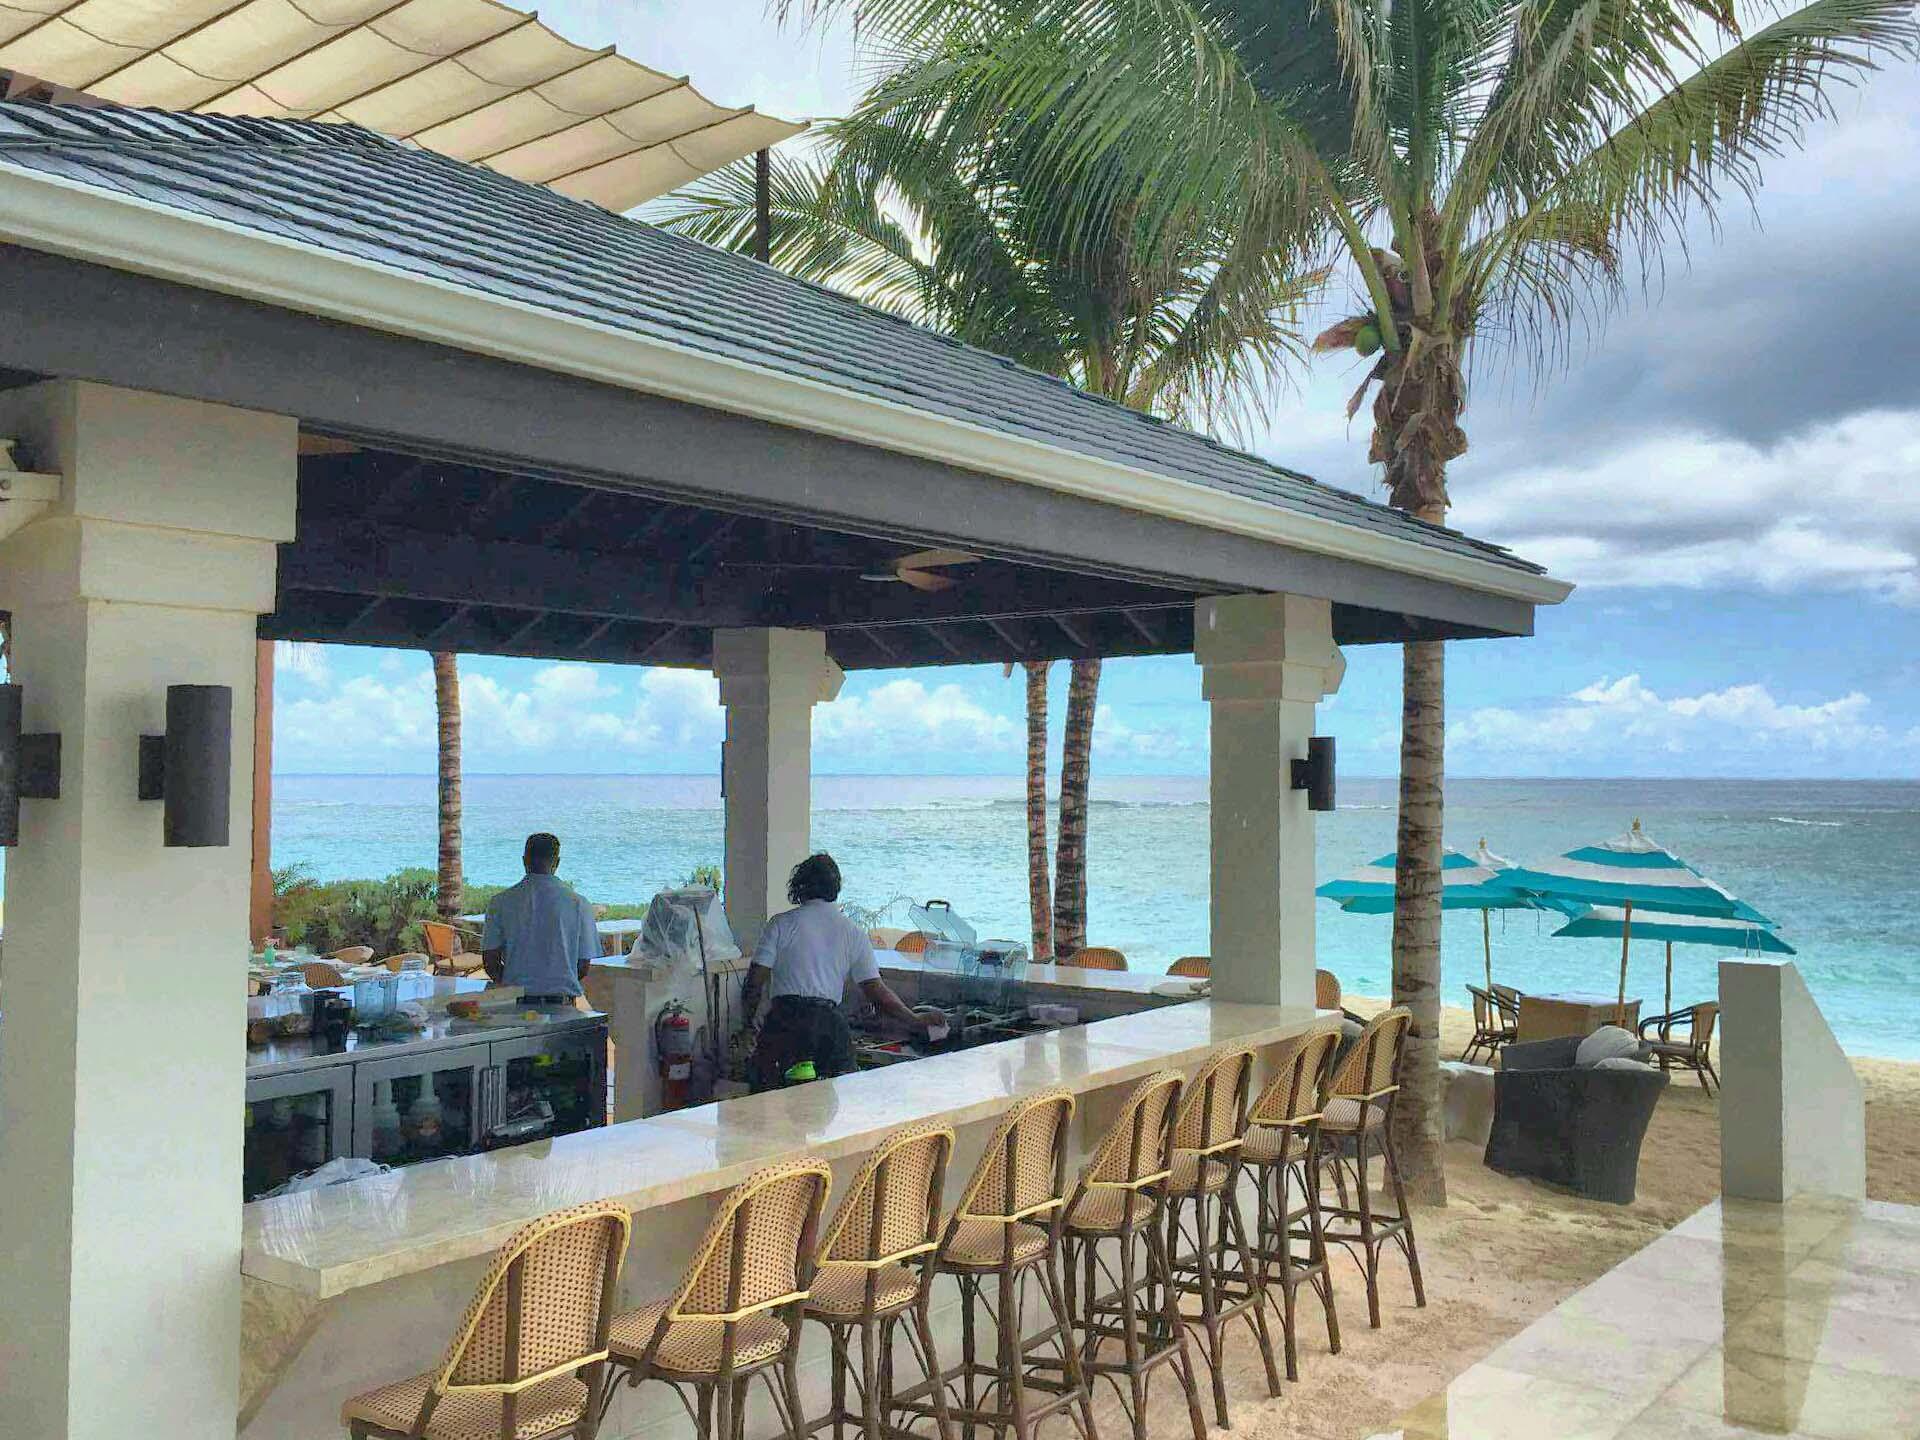 Anguilla S Zemi Beach House Welcomes New Beach Bar To Shoal Bay East Beach Bar Bums